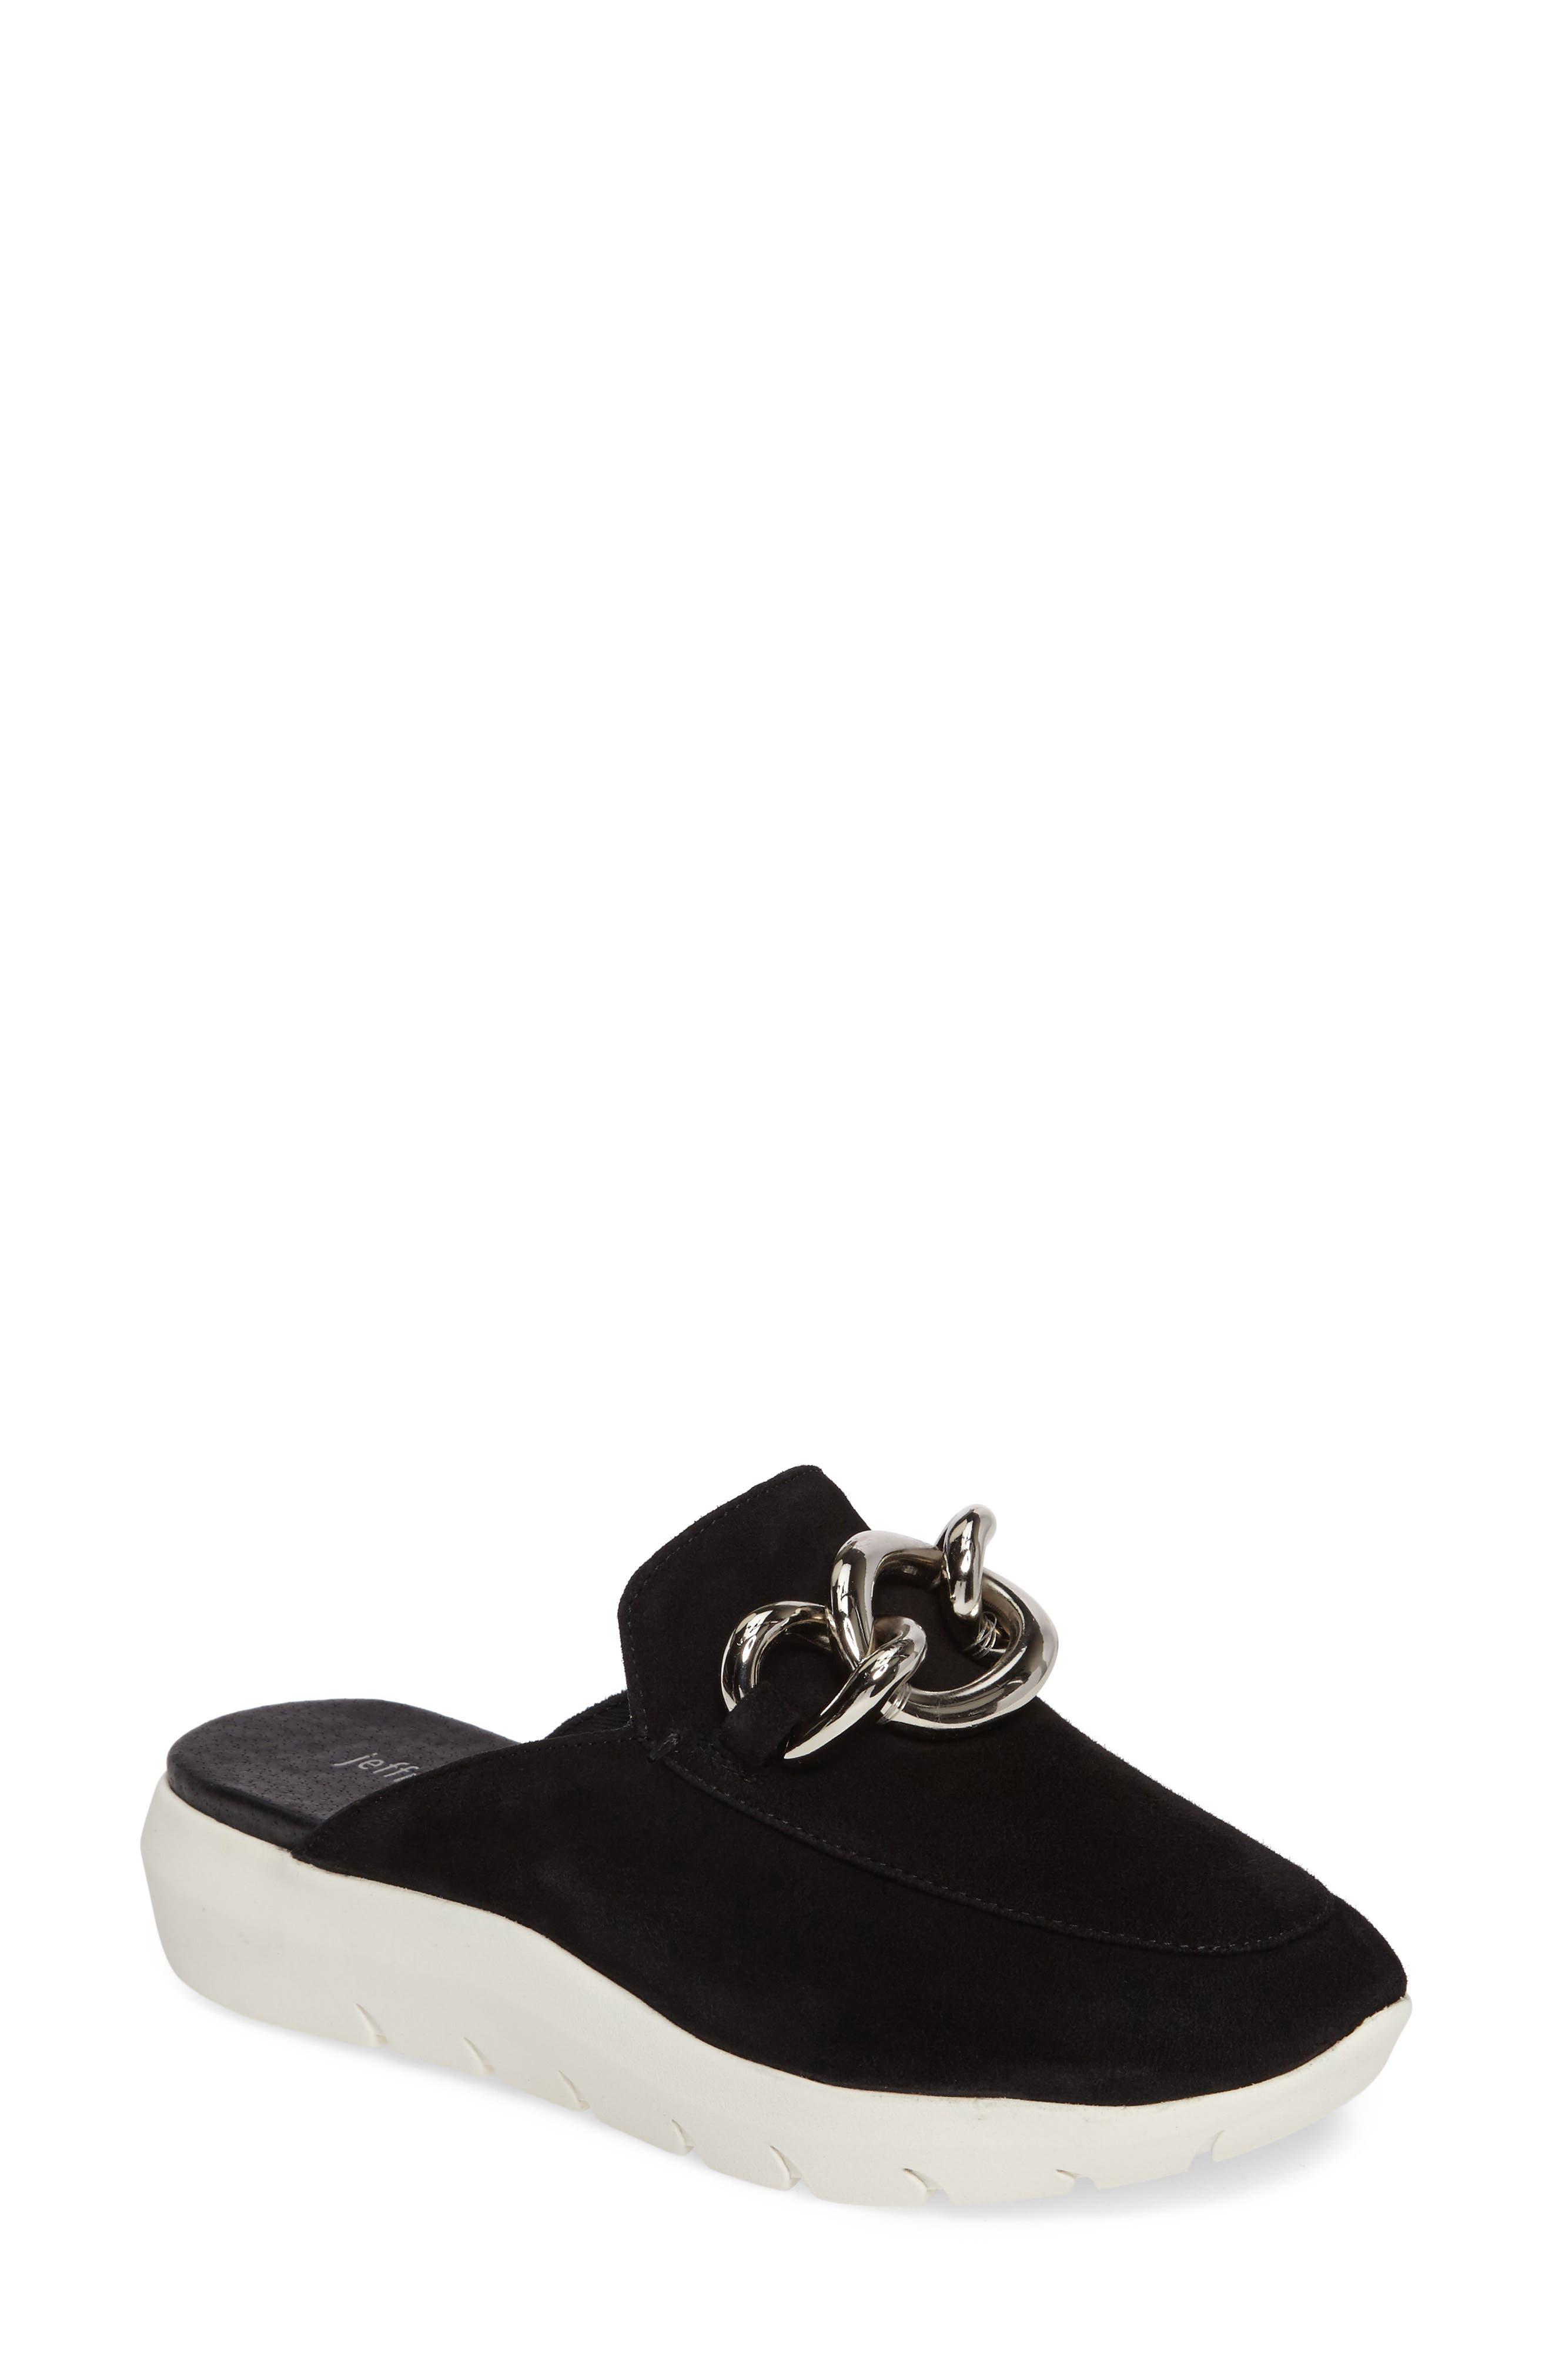 JEFFREY CAMPBELL Tibow Platform Slide Sneaker